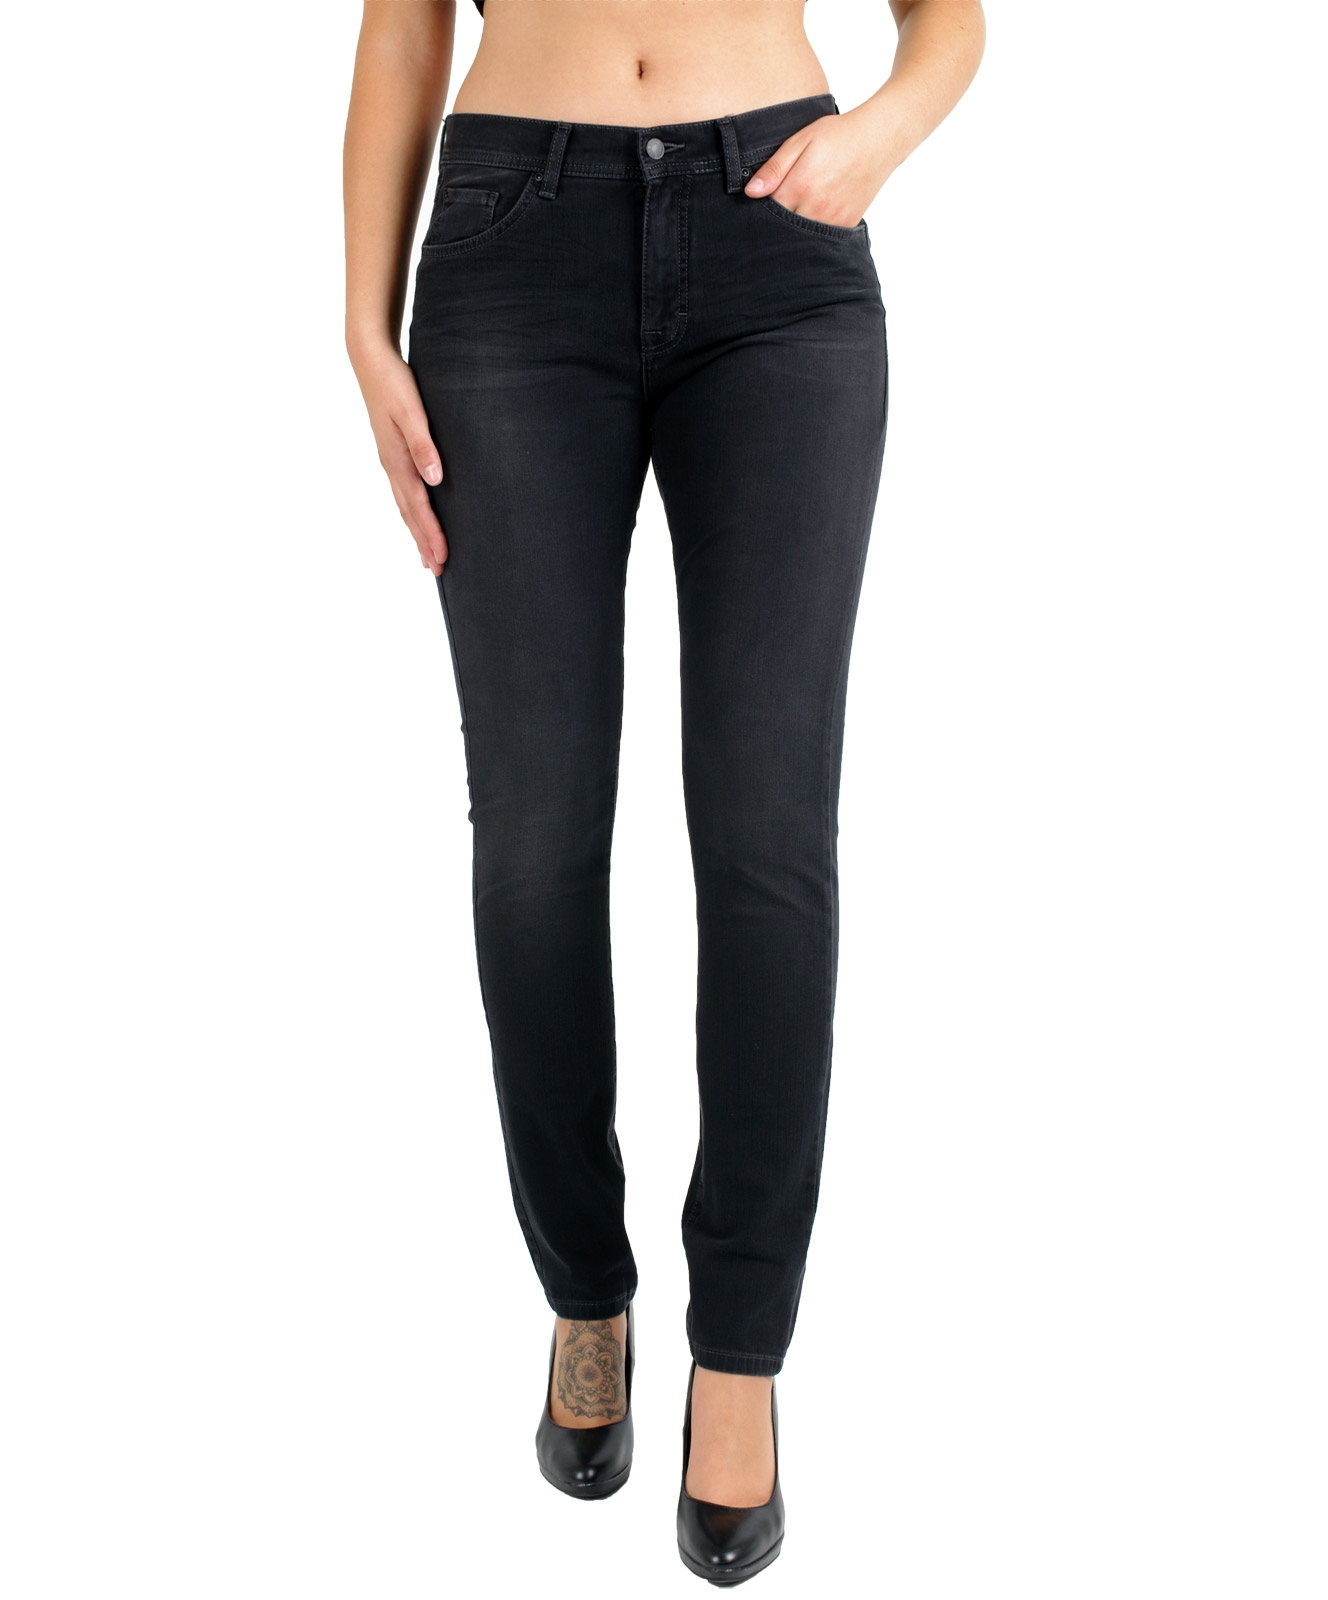 Hosen - Angels Jeans Röhre Skinny in Black  - Onlineshop Jeans Meile